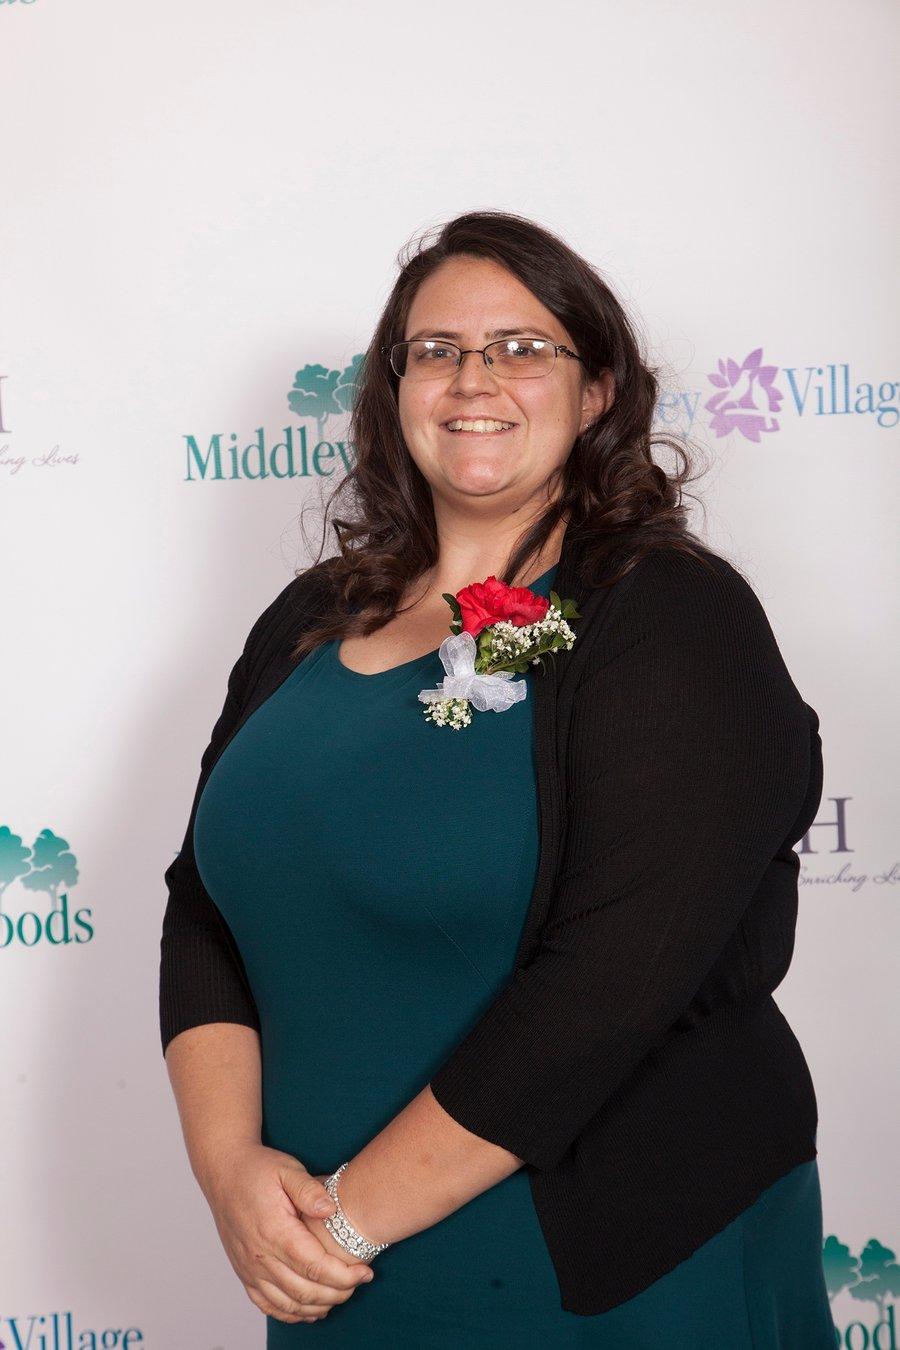 Vanessa Barnes, Dining Services